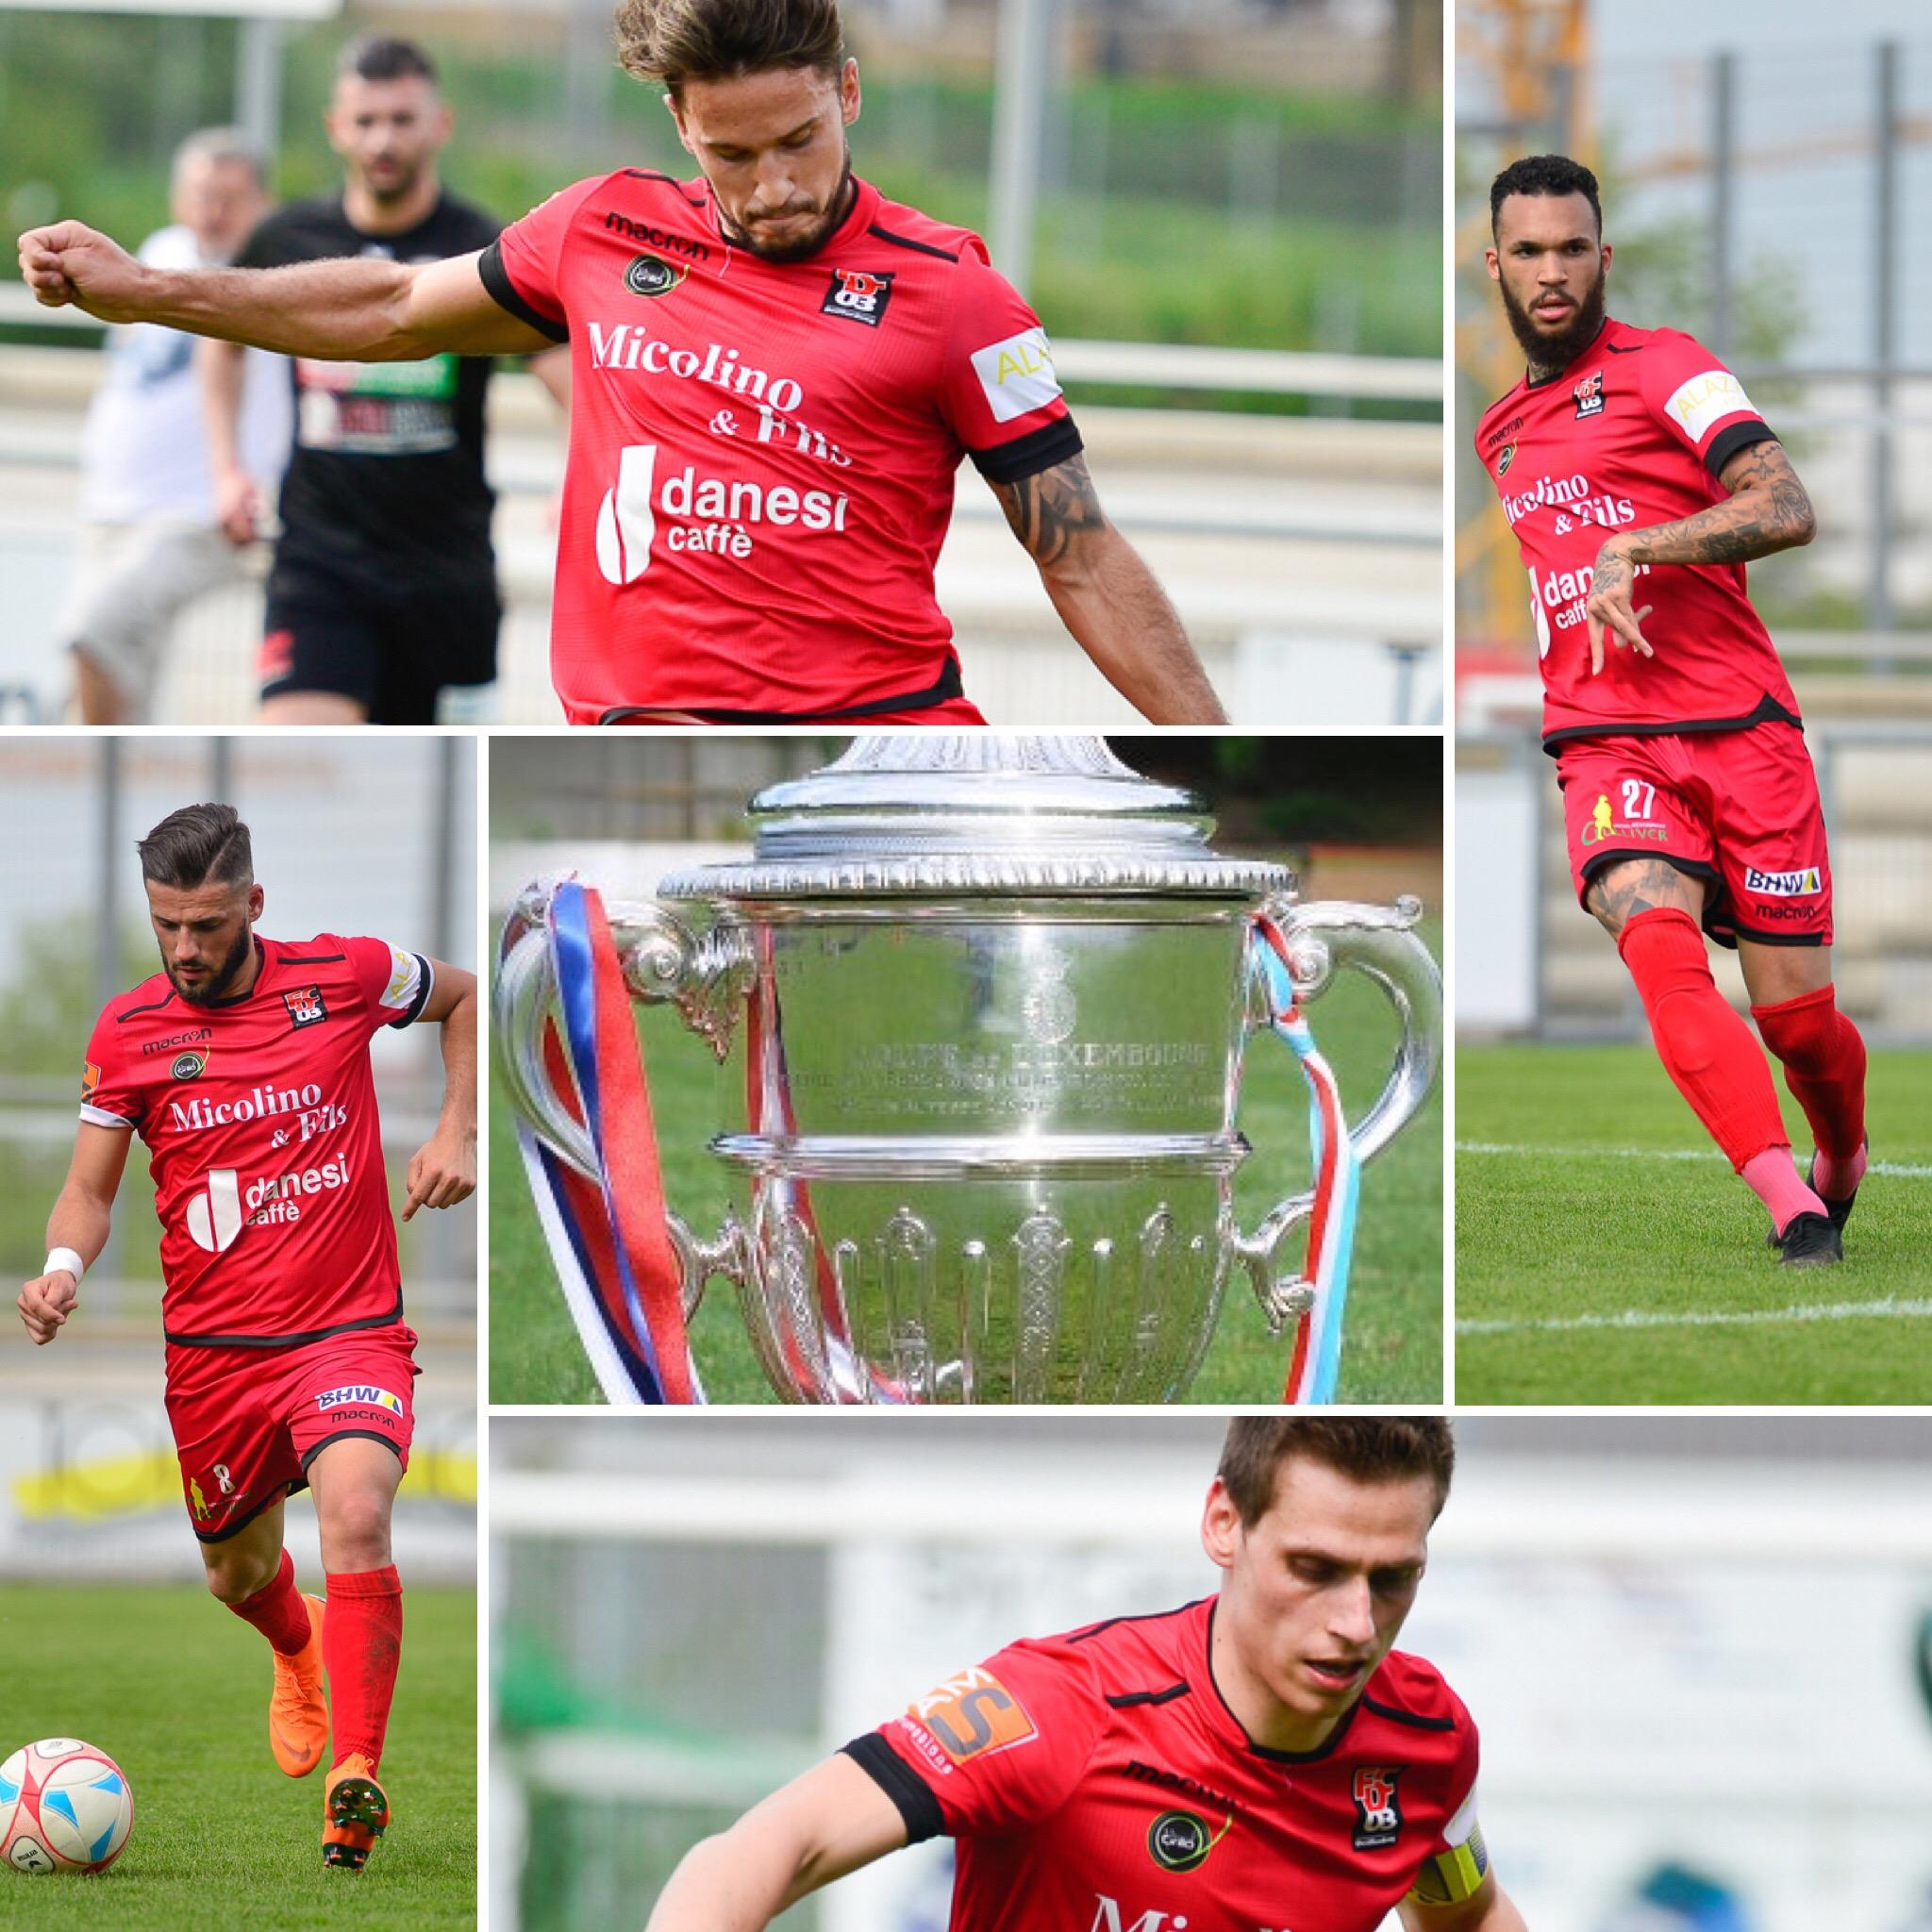 Coupe de Luxembourg 1/2 Finale